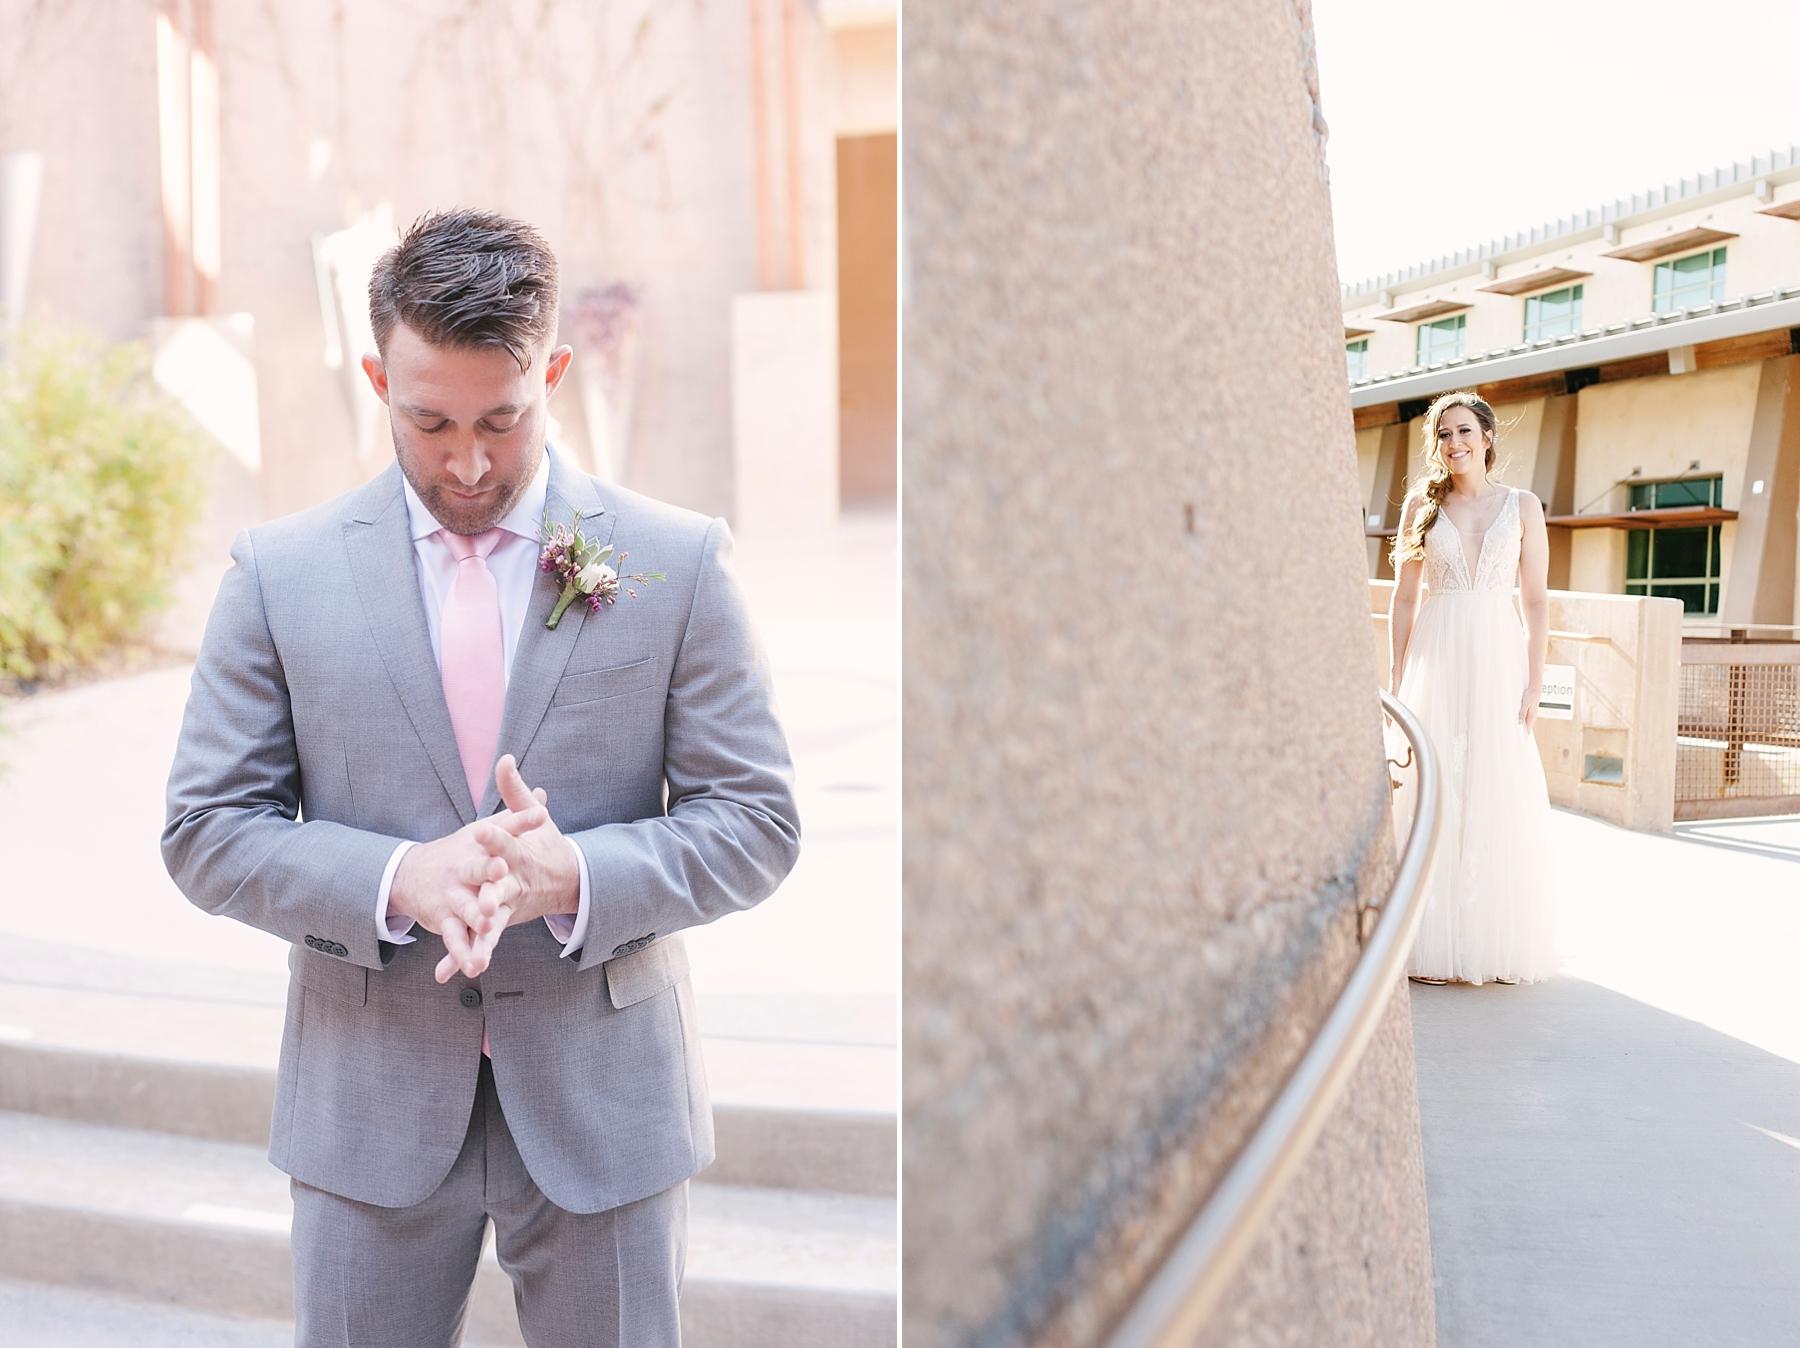 springs-preserve-wedding-las-vegas-destination-photography-the-emerics-11.jpg